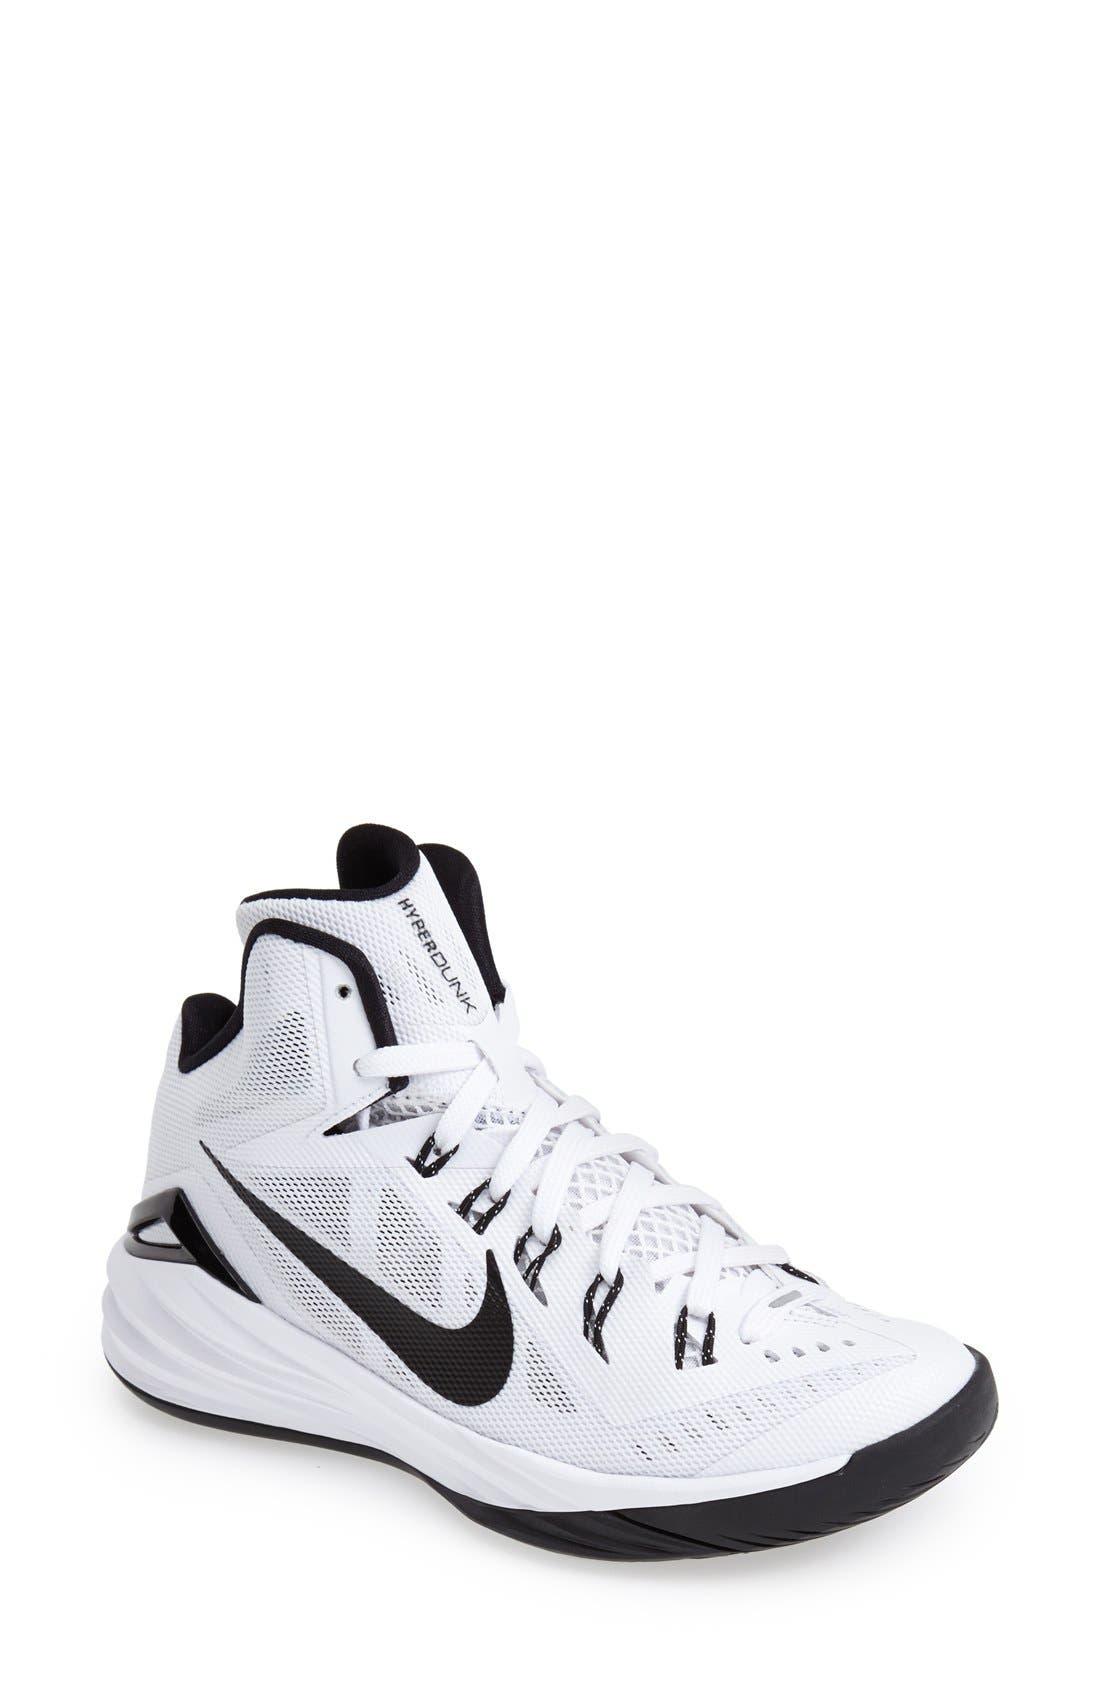 Main Image - Nike 'Hyperdunk 2014' Basketball Shoe (Women)